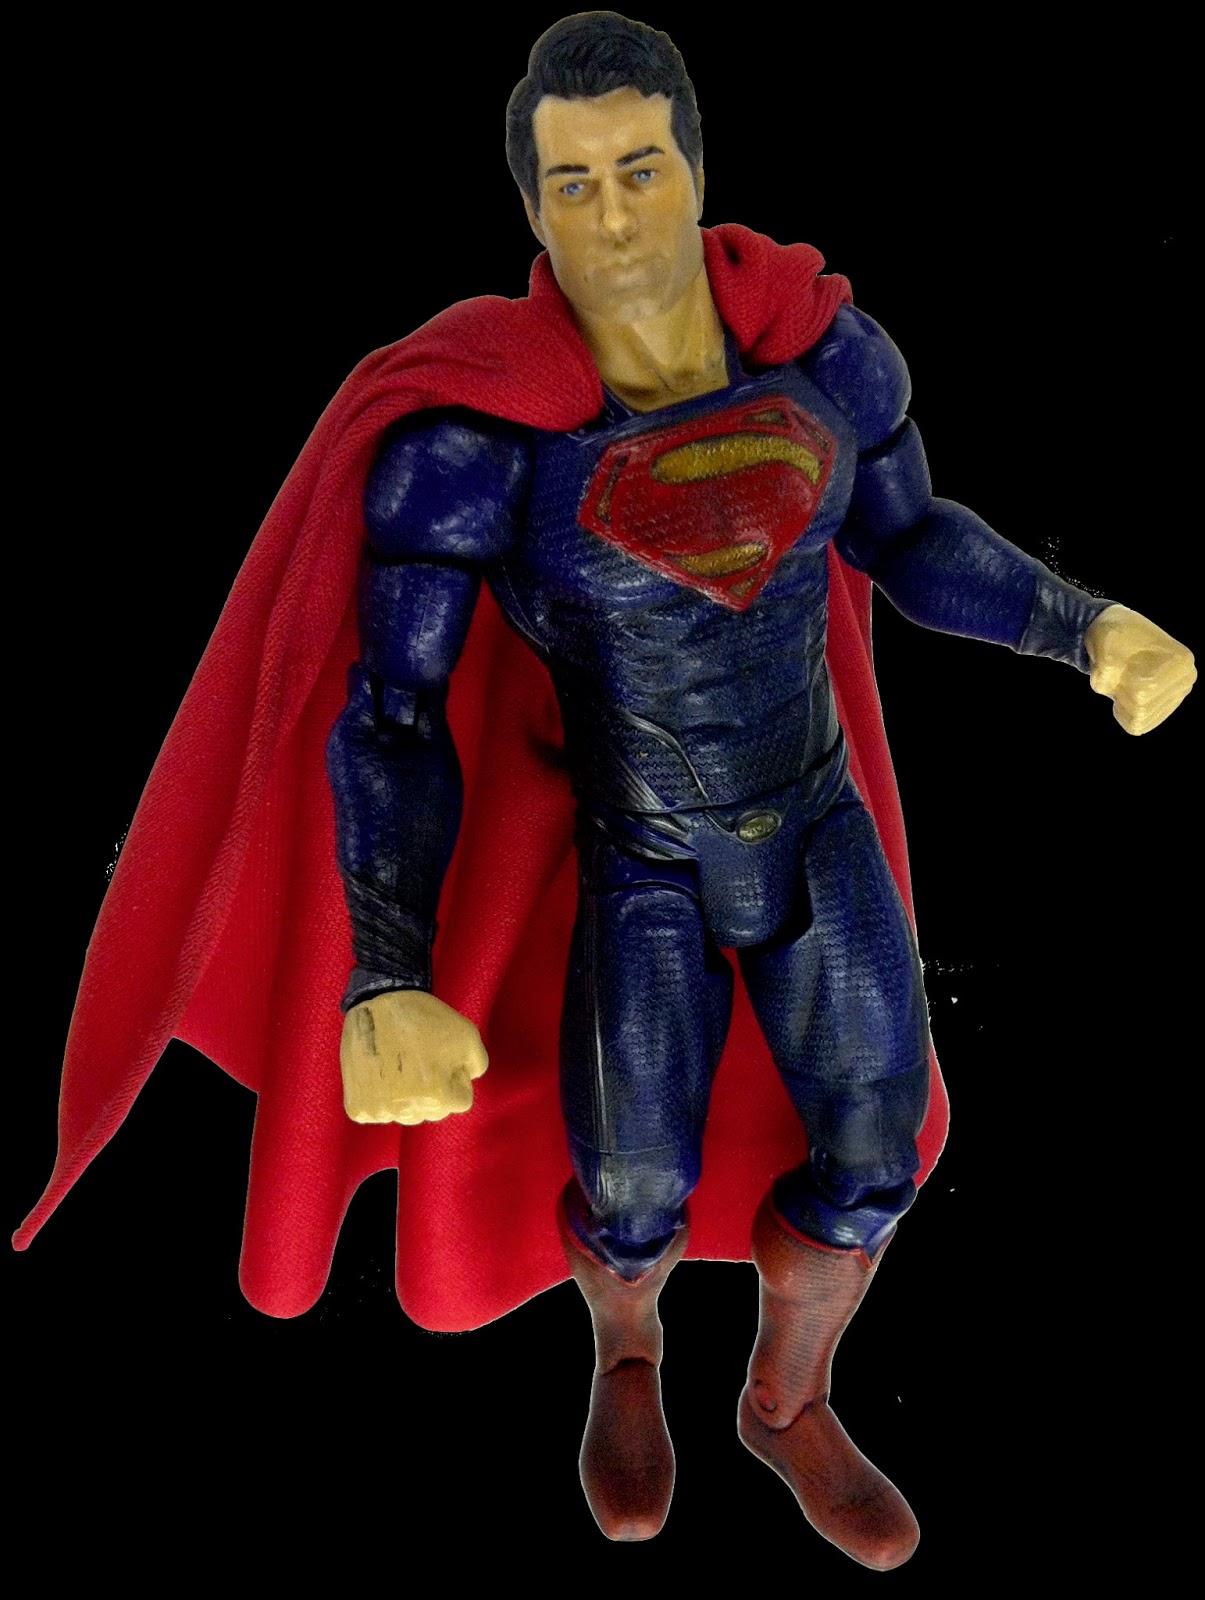 Robin Blake custom The Dark Knight Rises Movie Masters figure Review